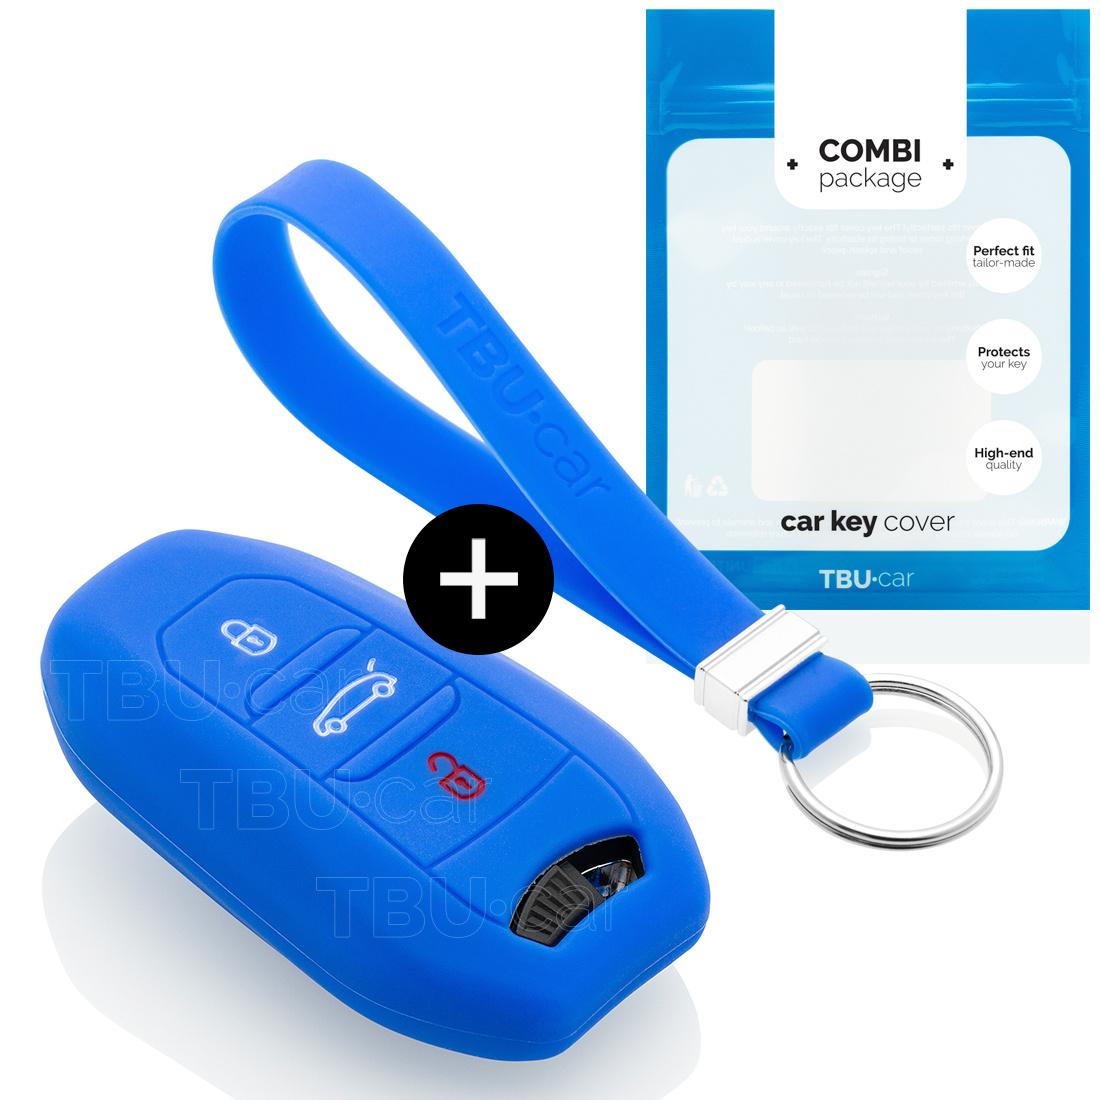 TBU car TBU car Autoschlüssel Hülle kompatibel mit Peugeot 3 Tasten (Keyless Entry) - Schutzhülle aus Silikon - Auto Schlüsselhülle Cover in Blau